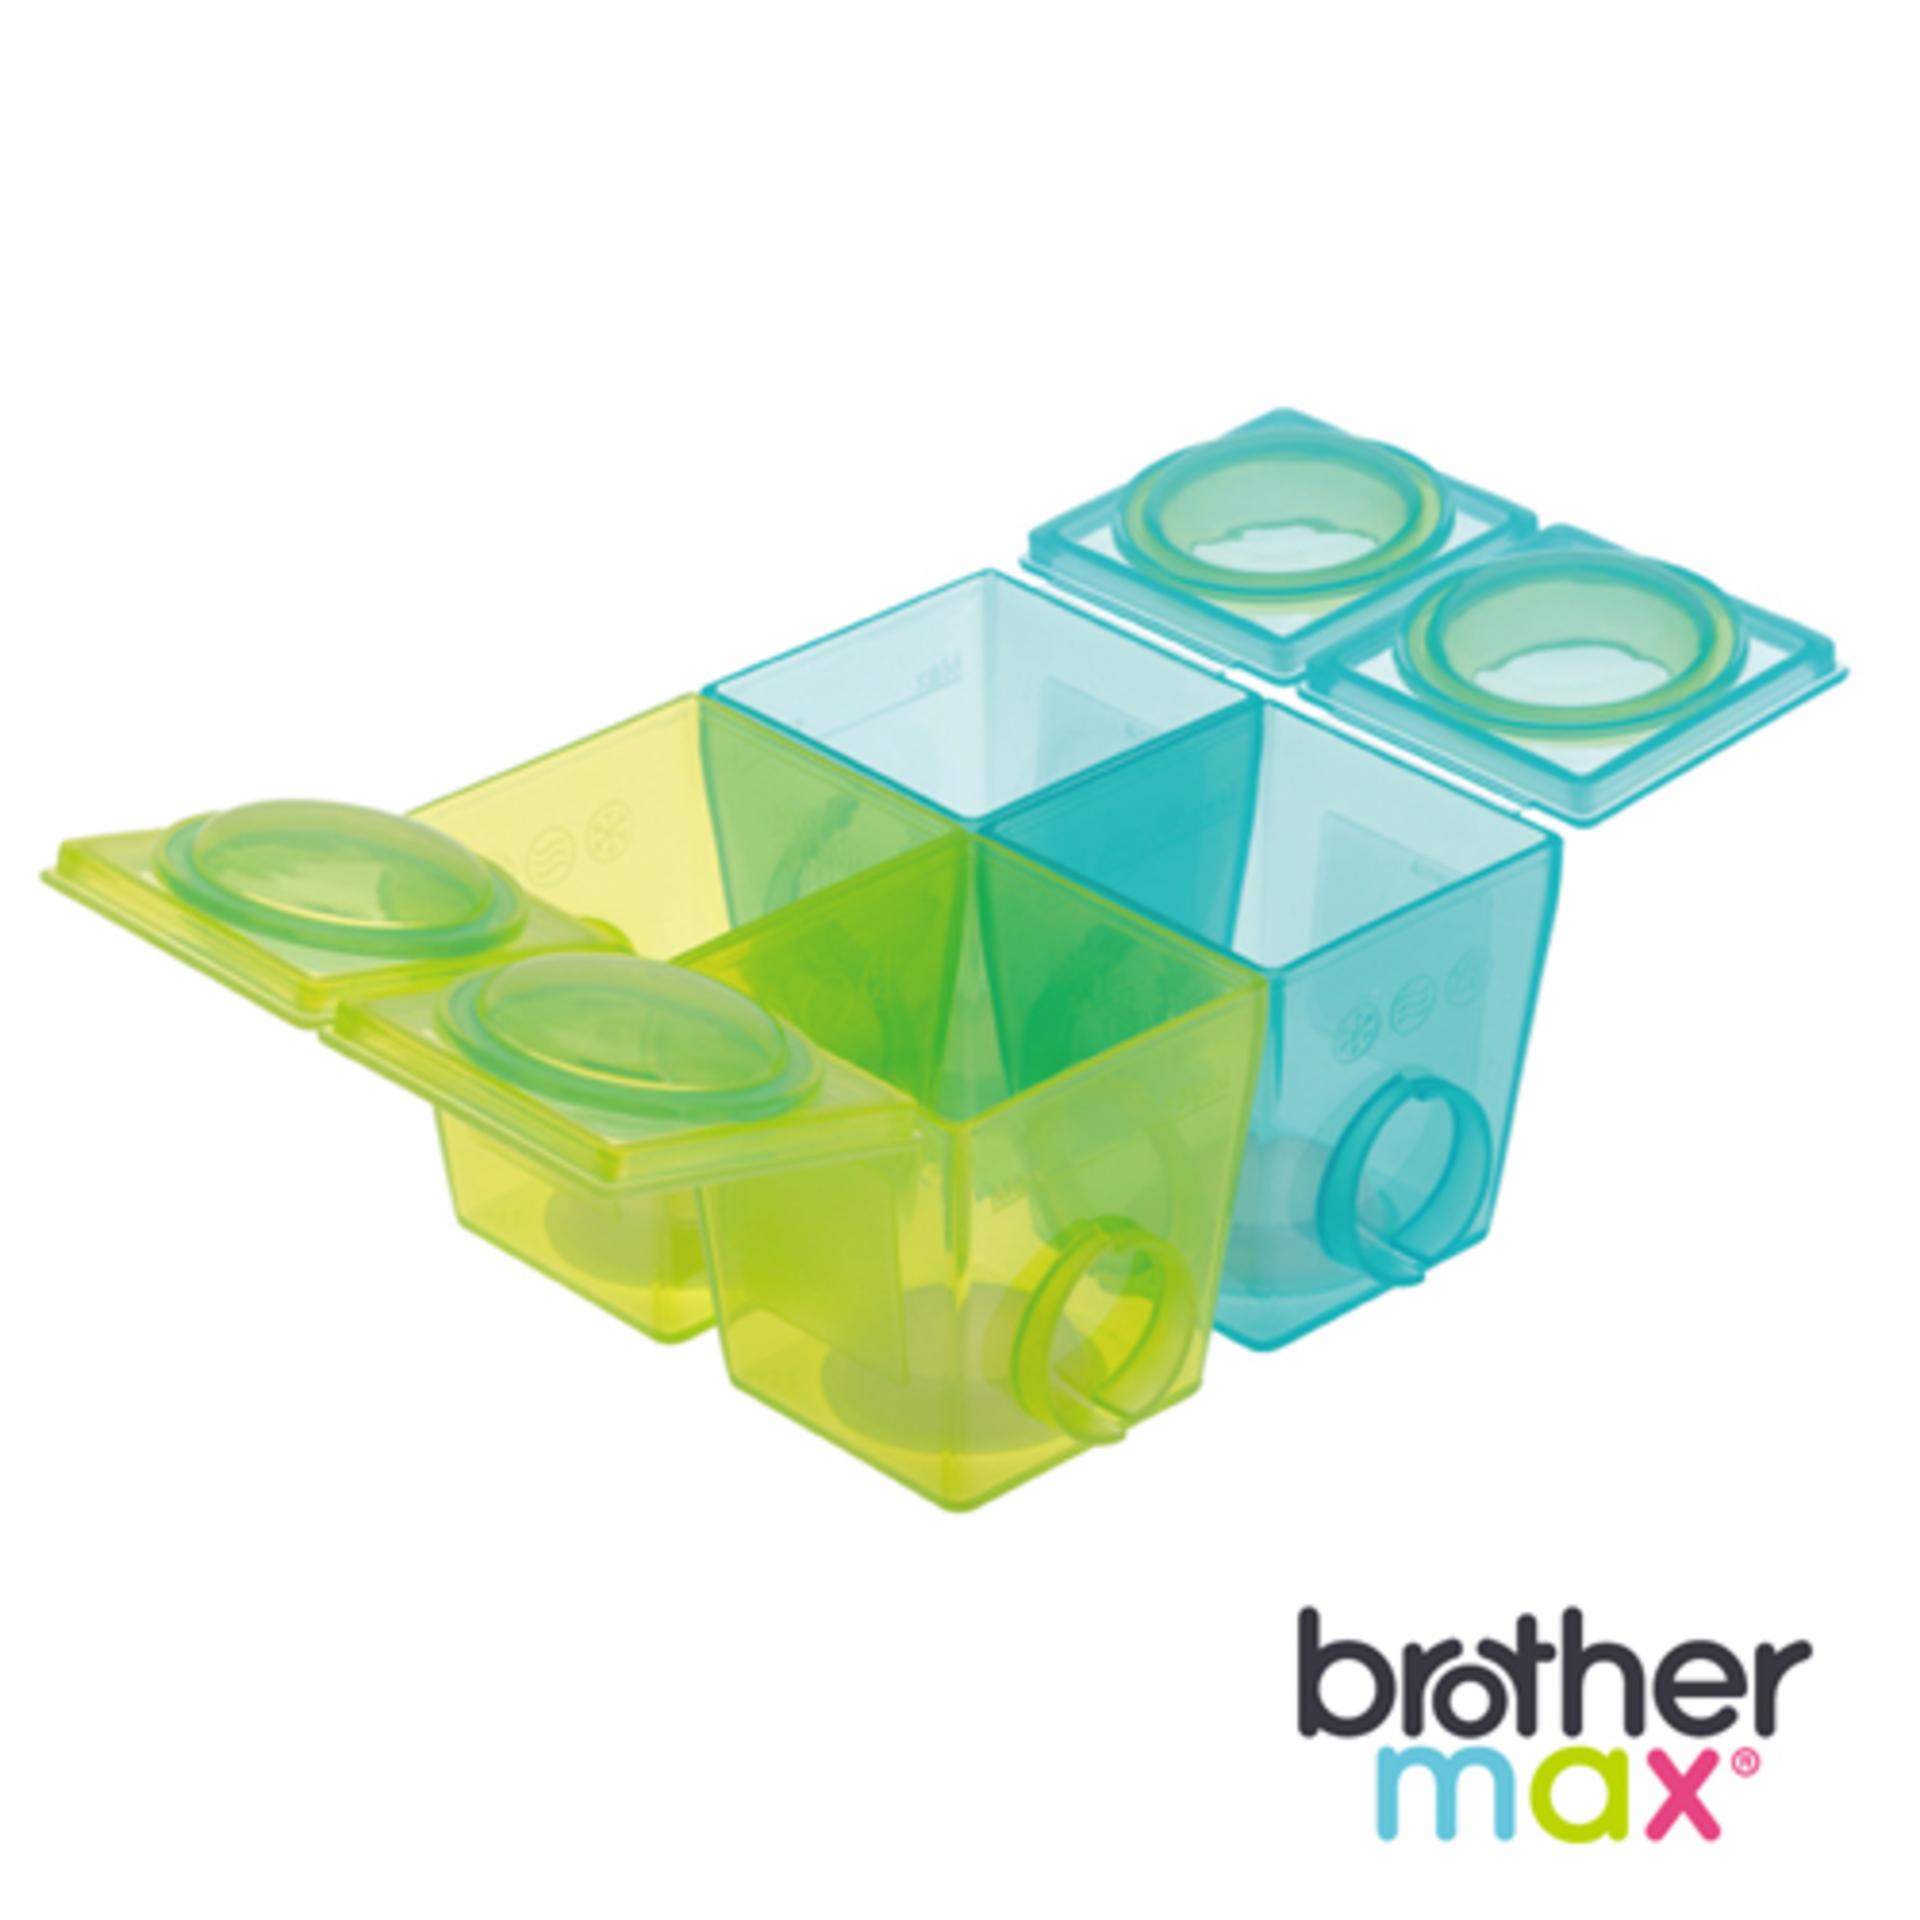 Brother Max 副食品分裝盒 大號4盒, 冰磚王